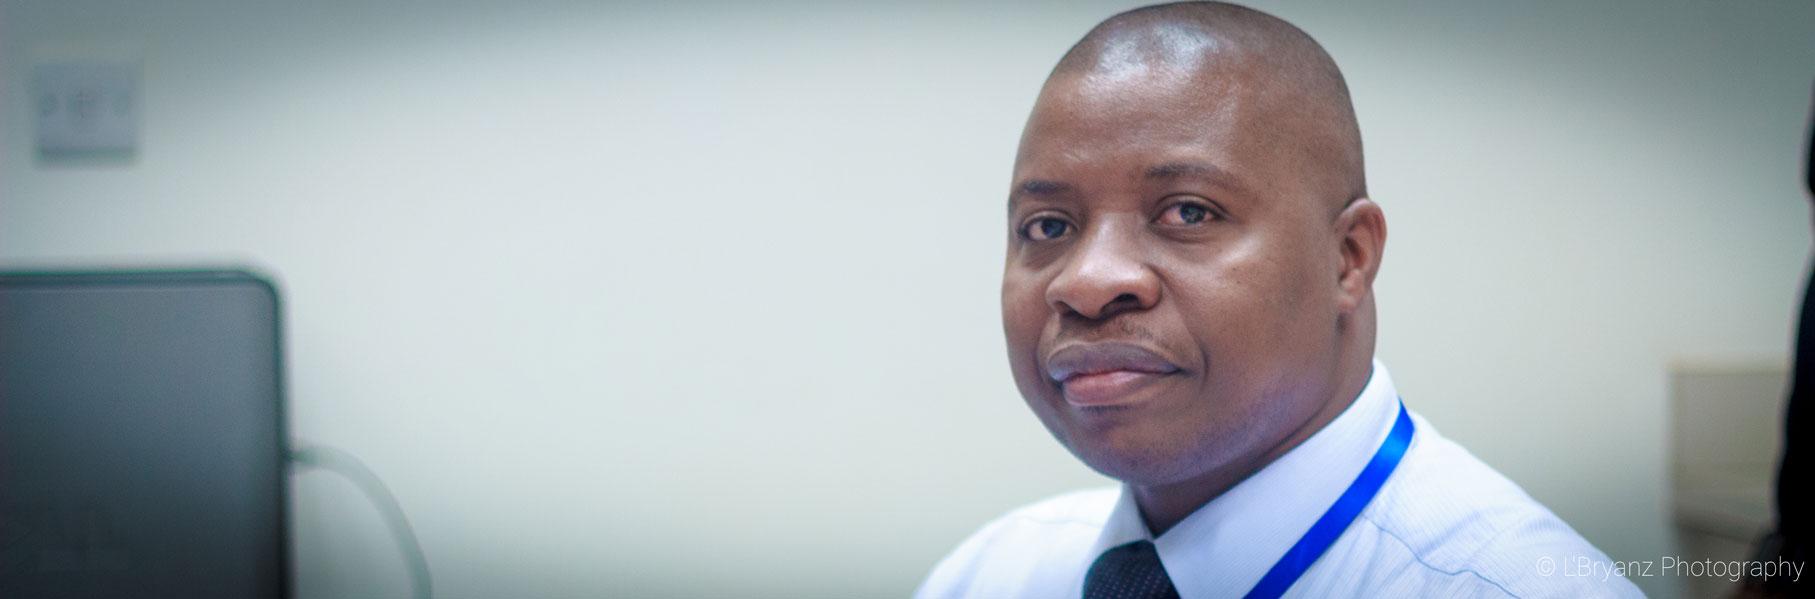 Mr Benjamin Mwesige